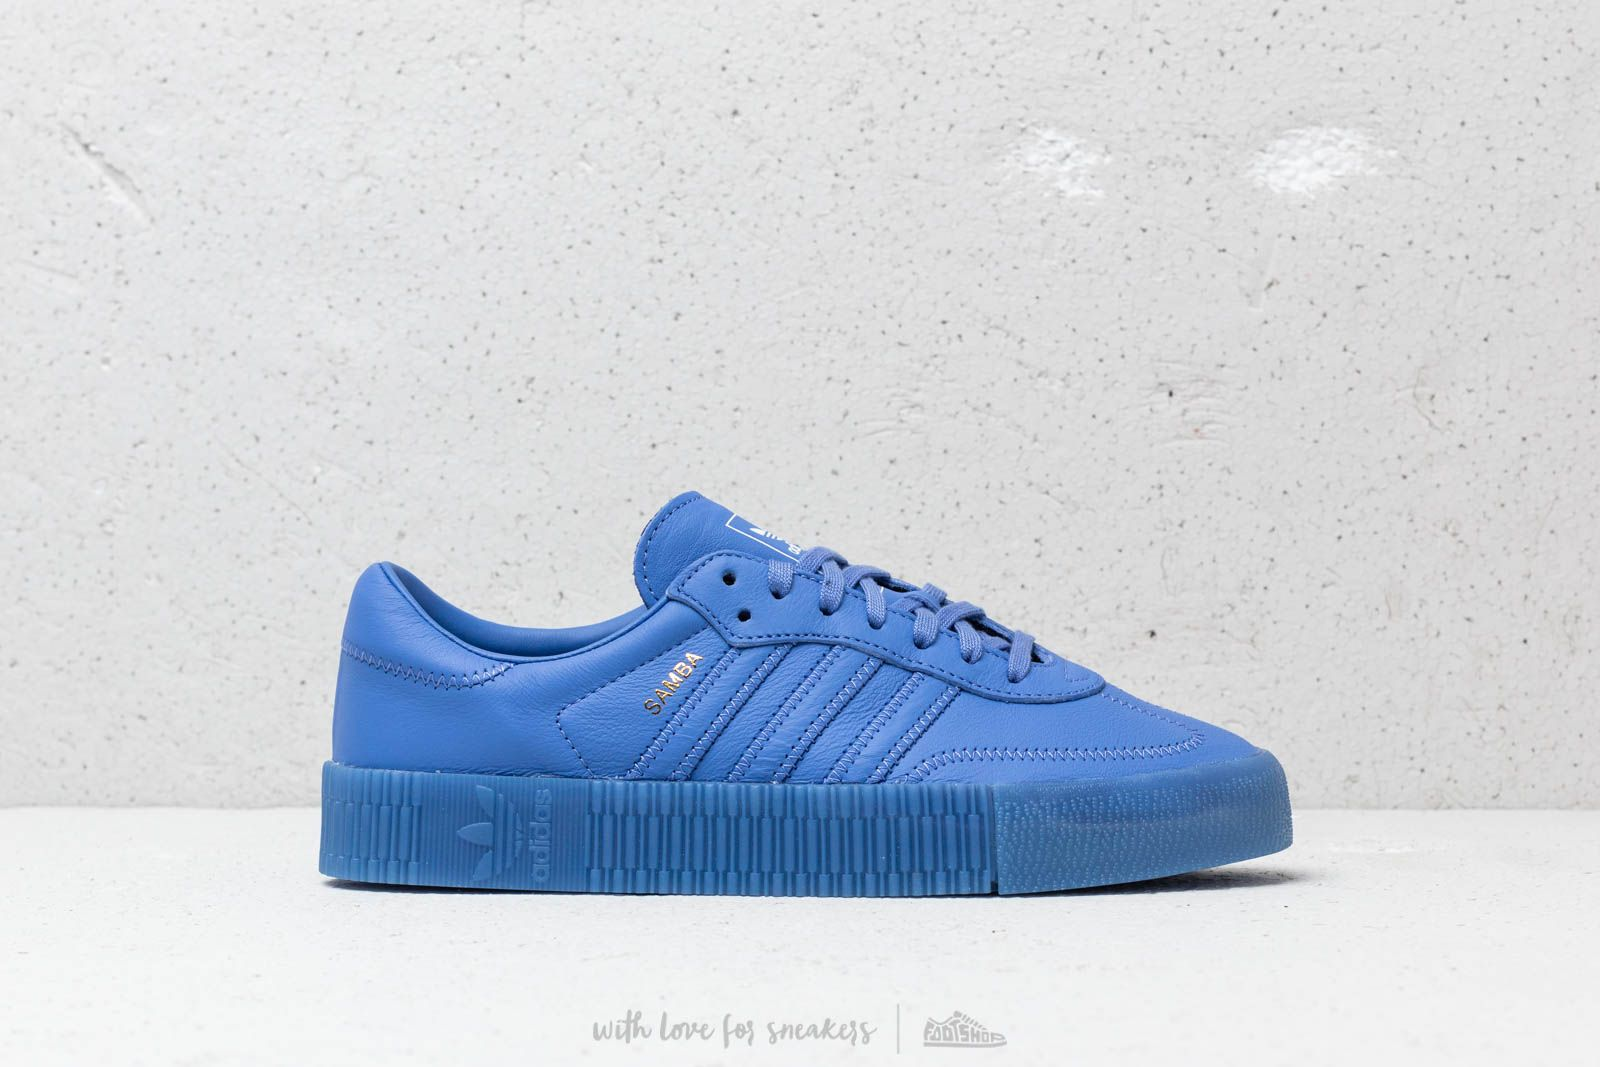 LilacFootshop Sambarose Sambarose W Real Adidas Sambarose LilacFootshop Adidas Adidas Real W GqSVzpUM